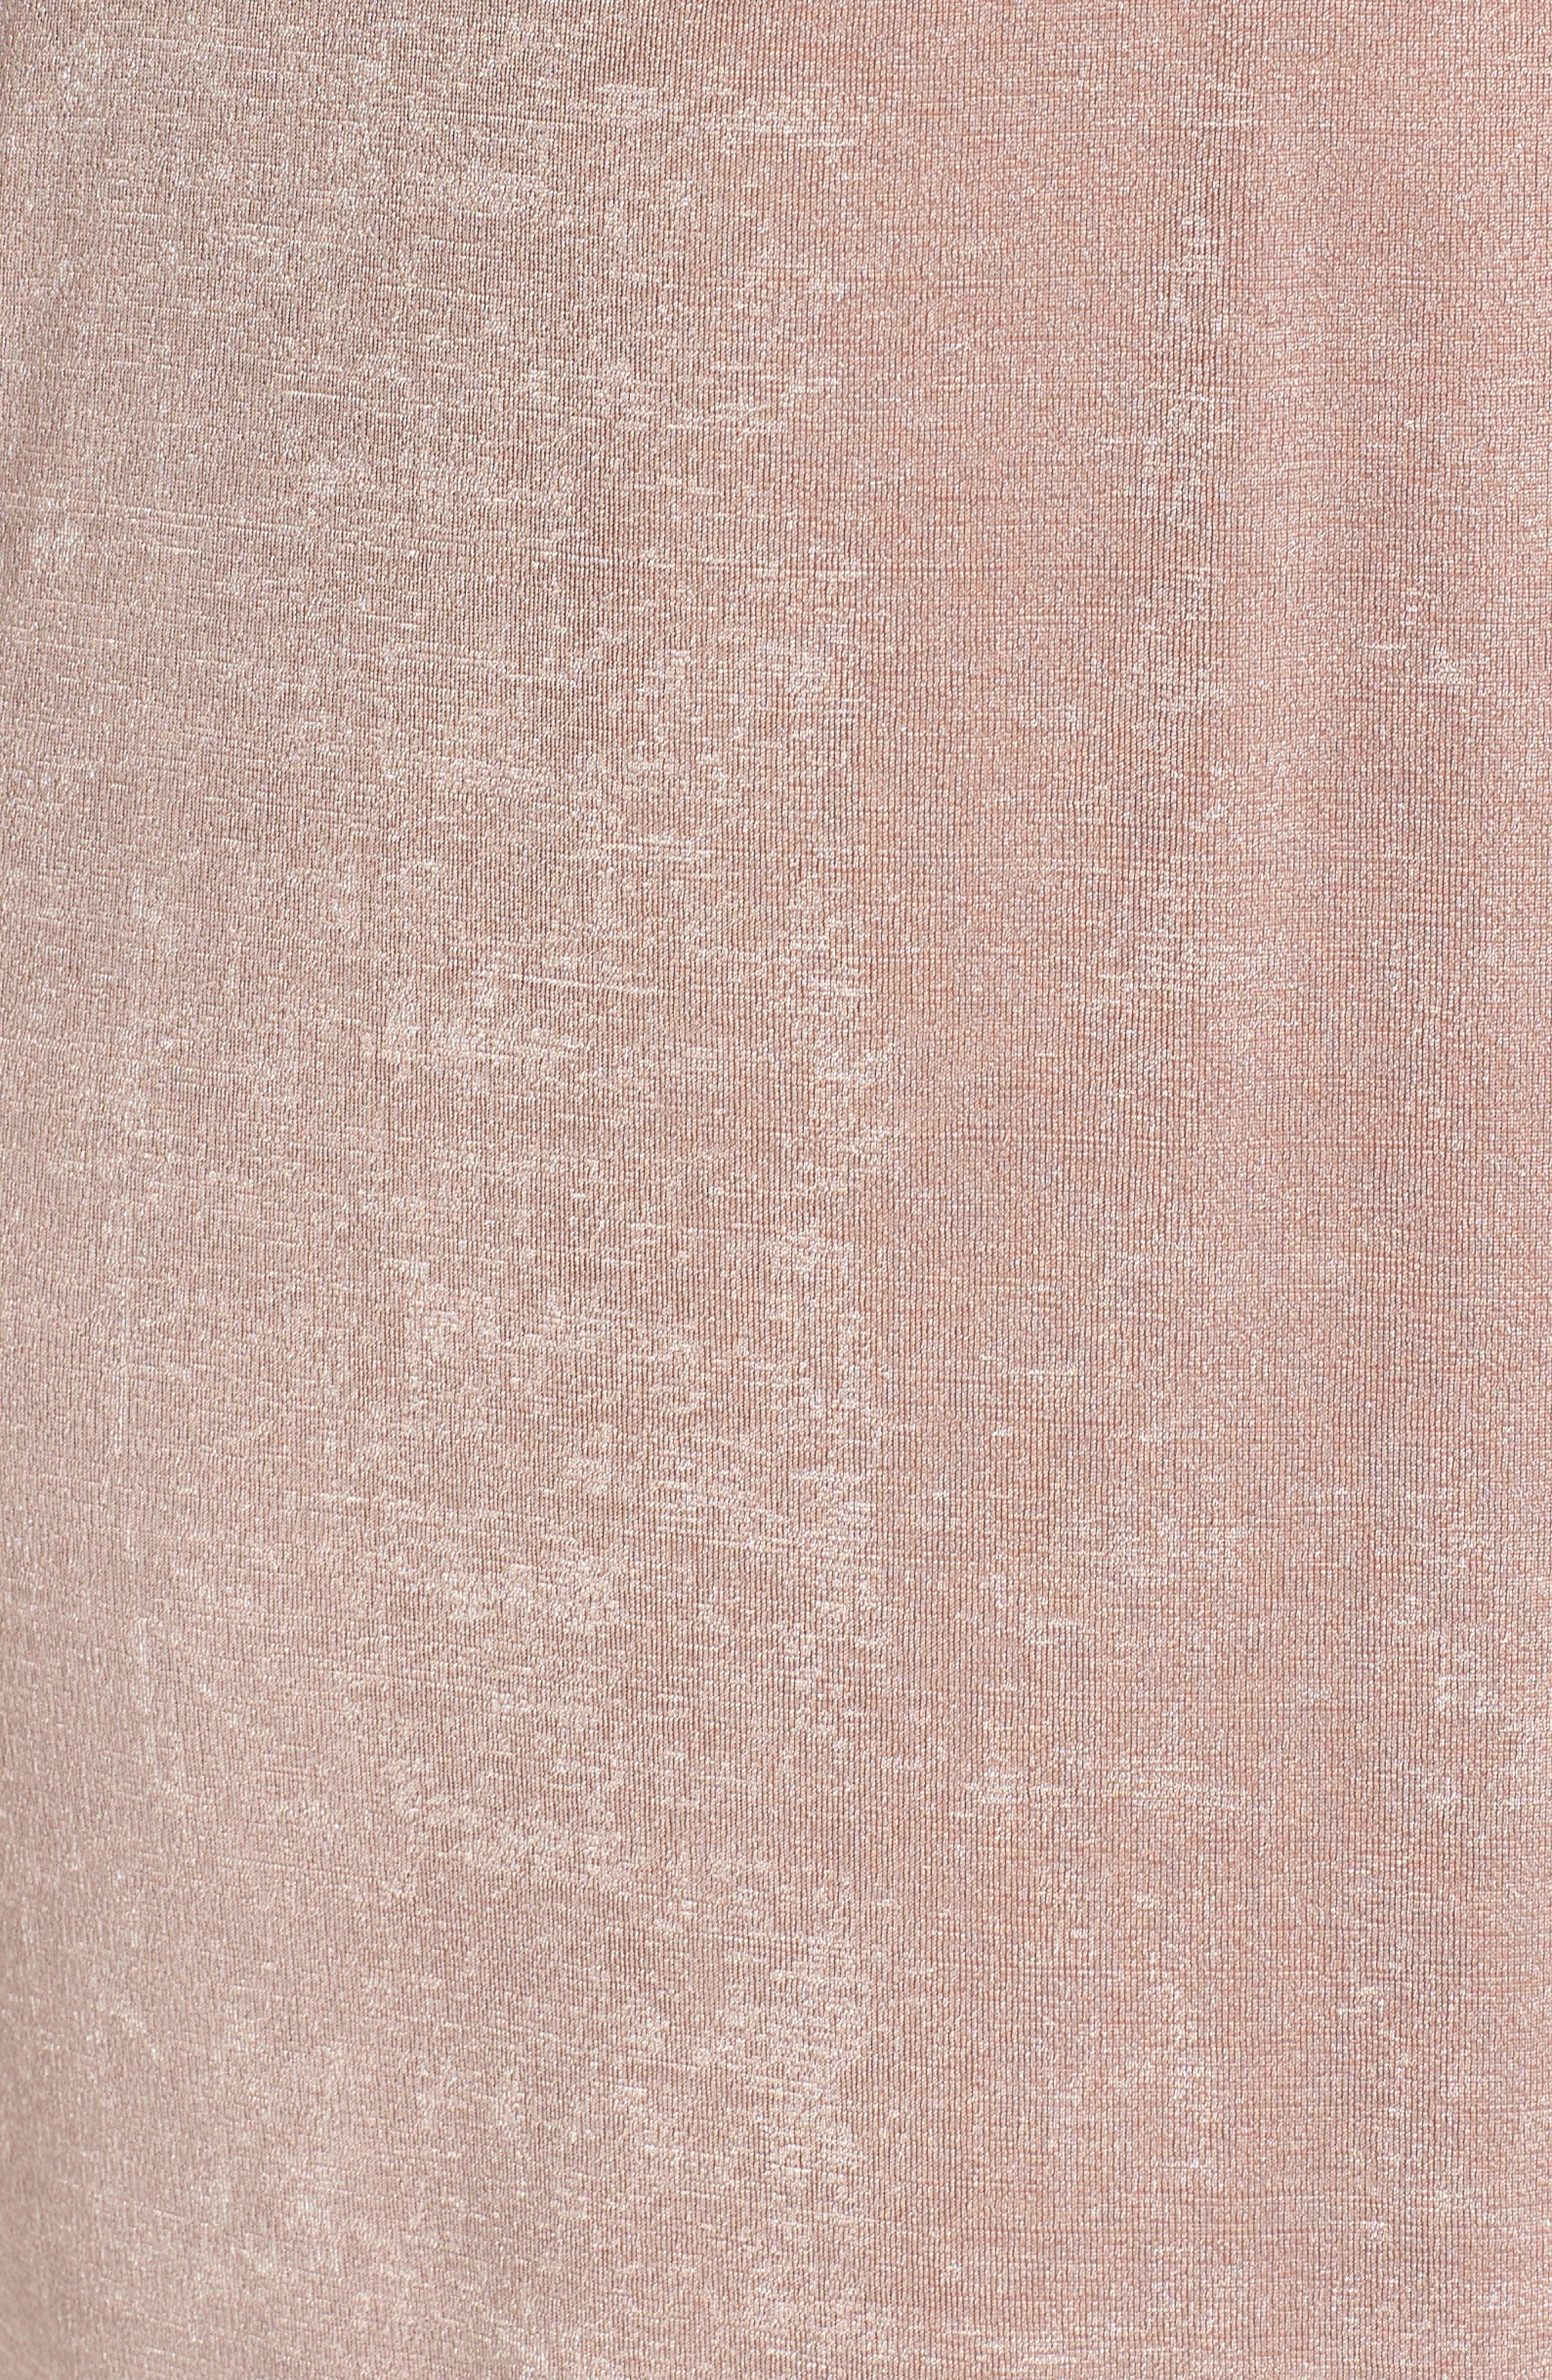 Wrap Dress,                             Alternate thumbnail 6, color,                             Blush